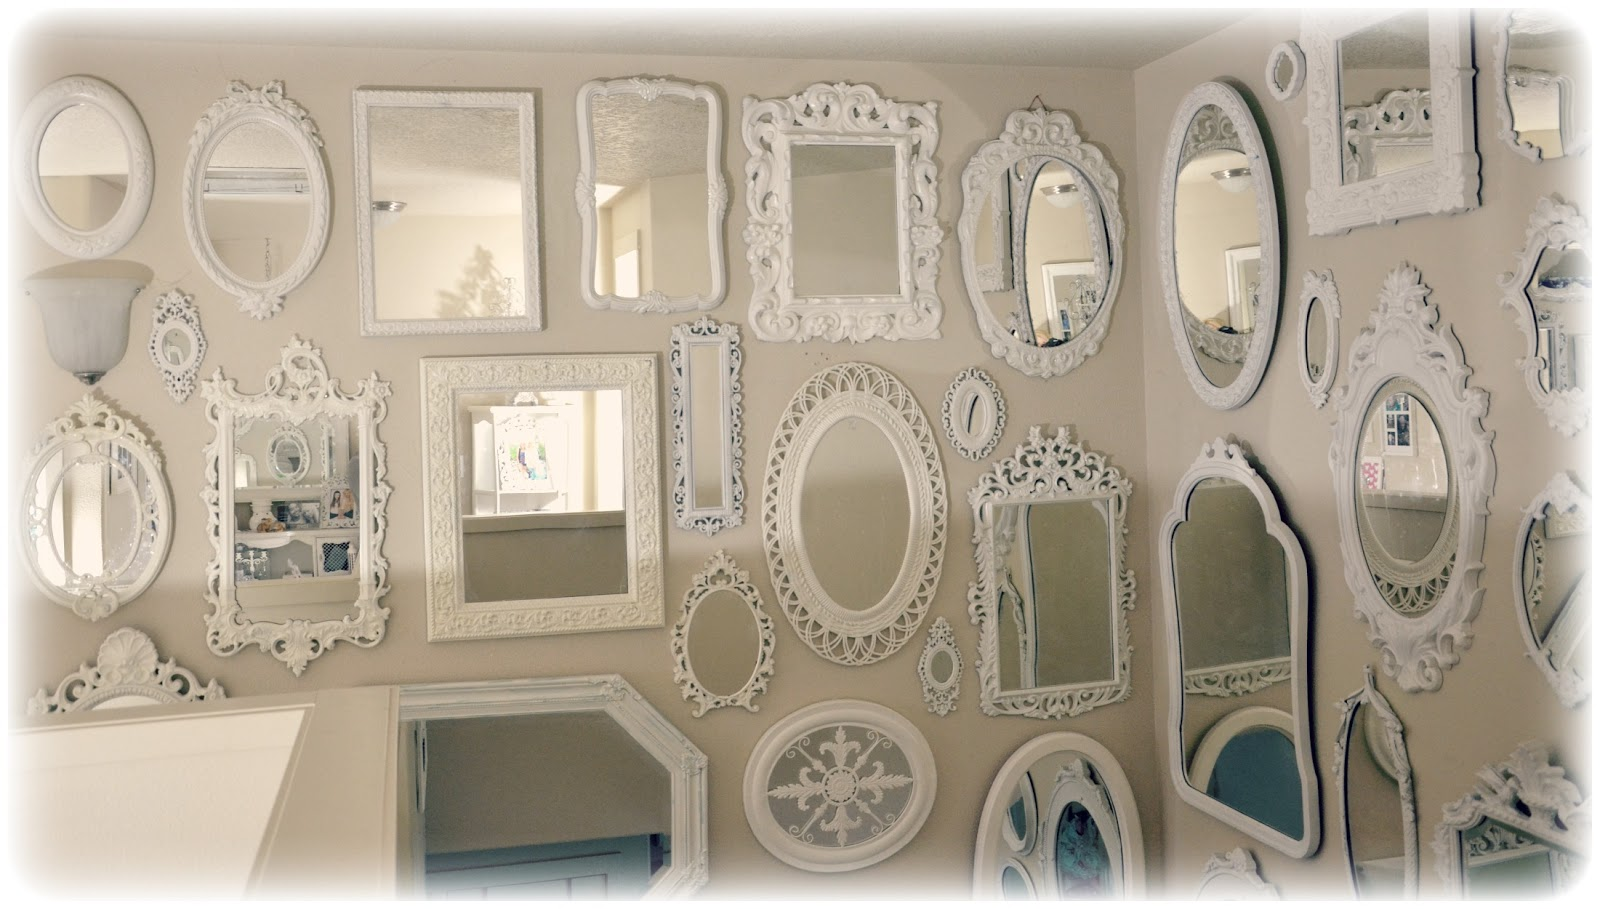 Not So Shabby - Shabby Chic: More Mirrors Mirrors Mirrors!